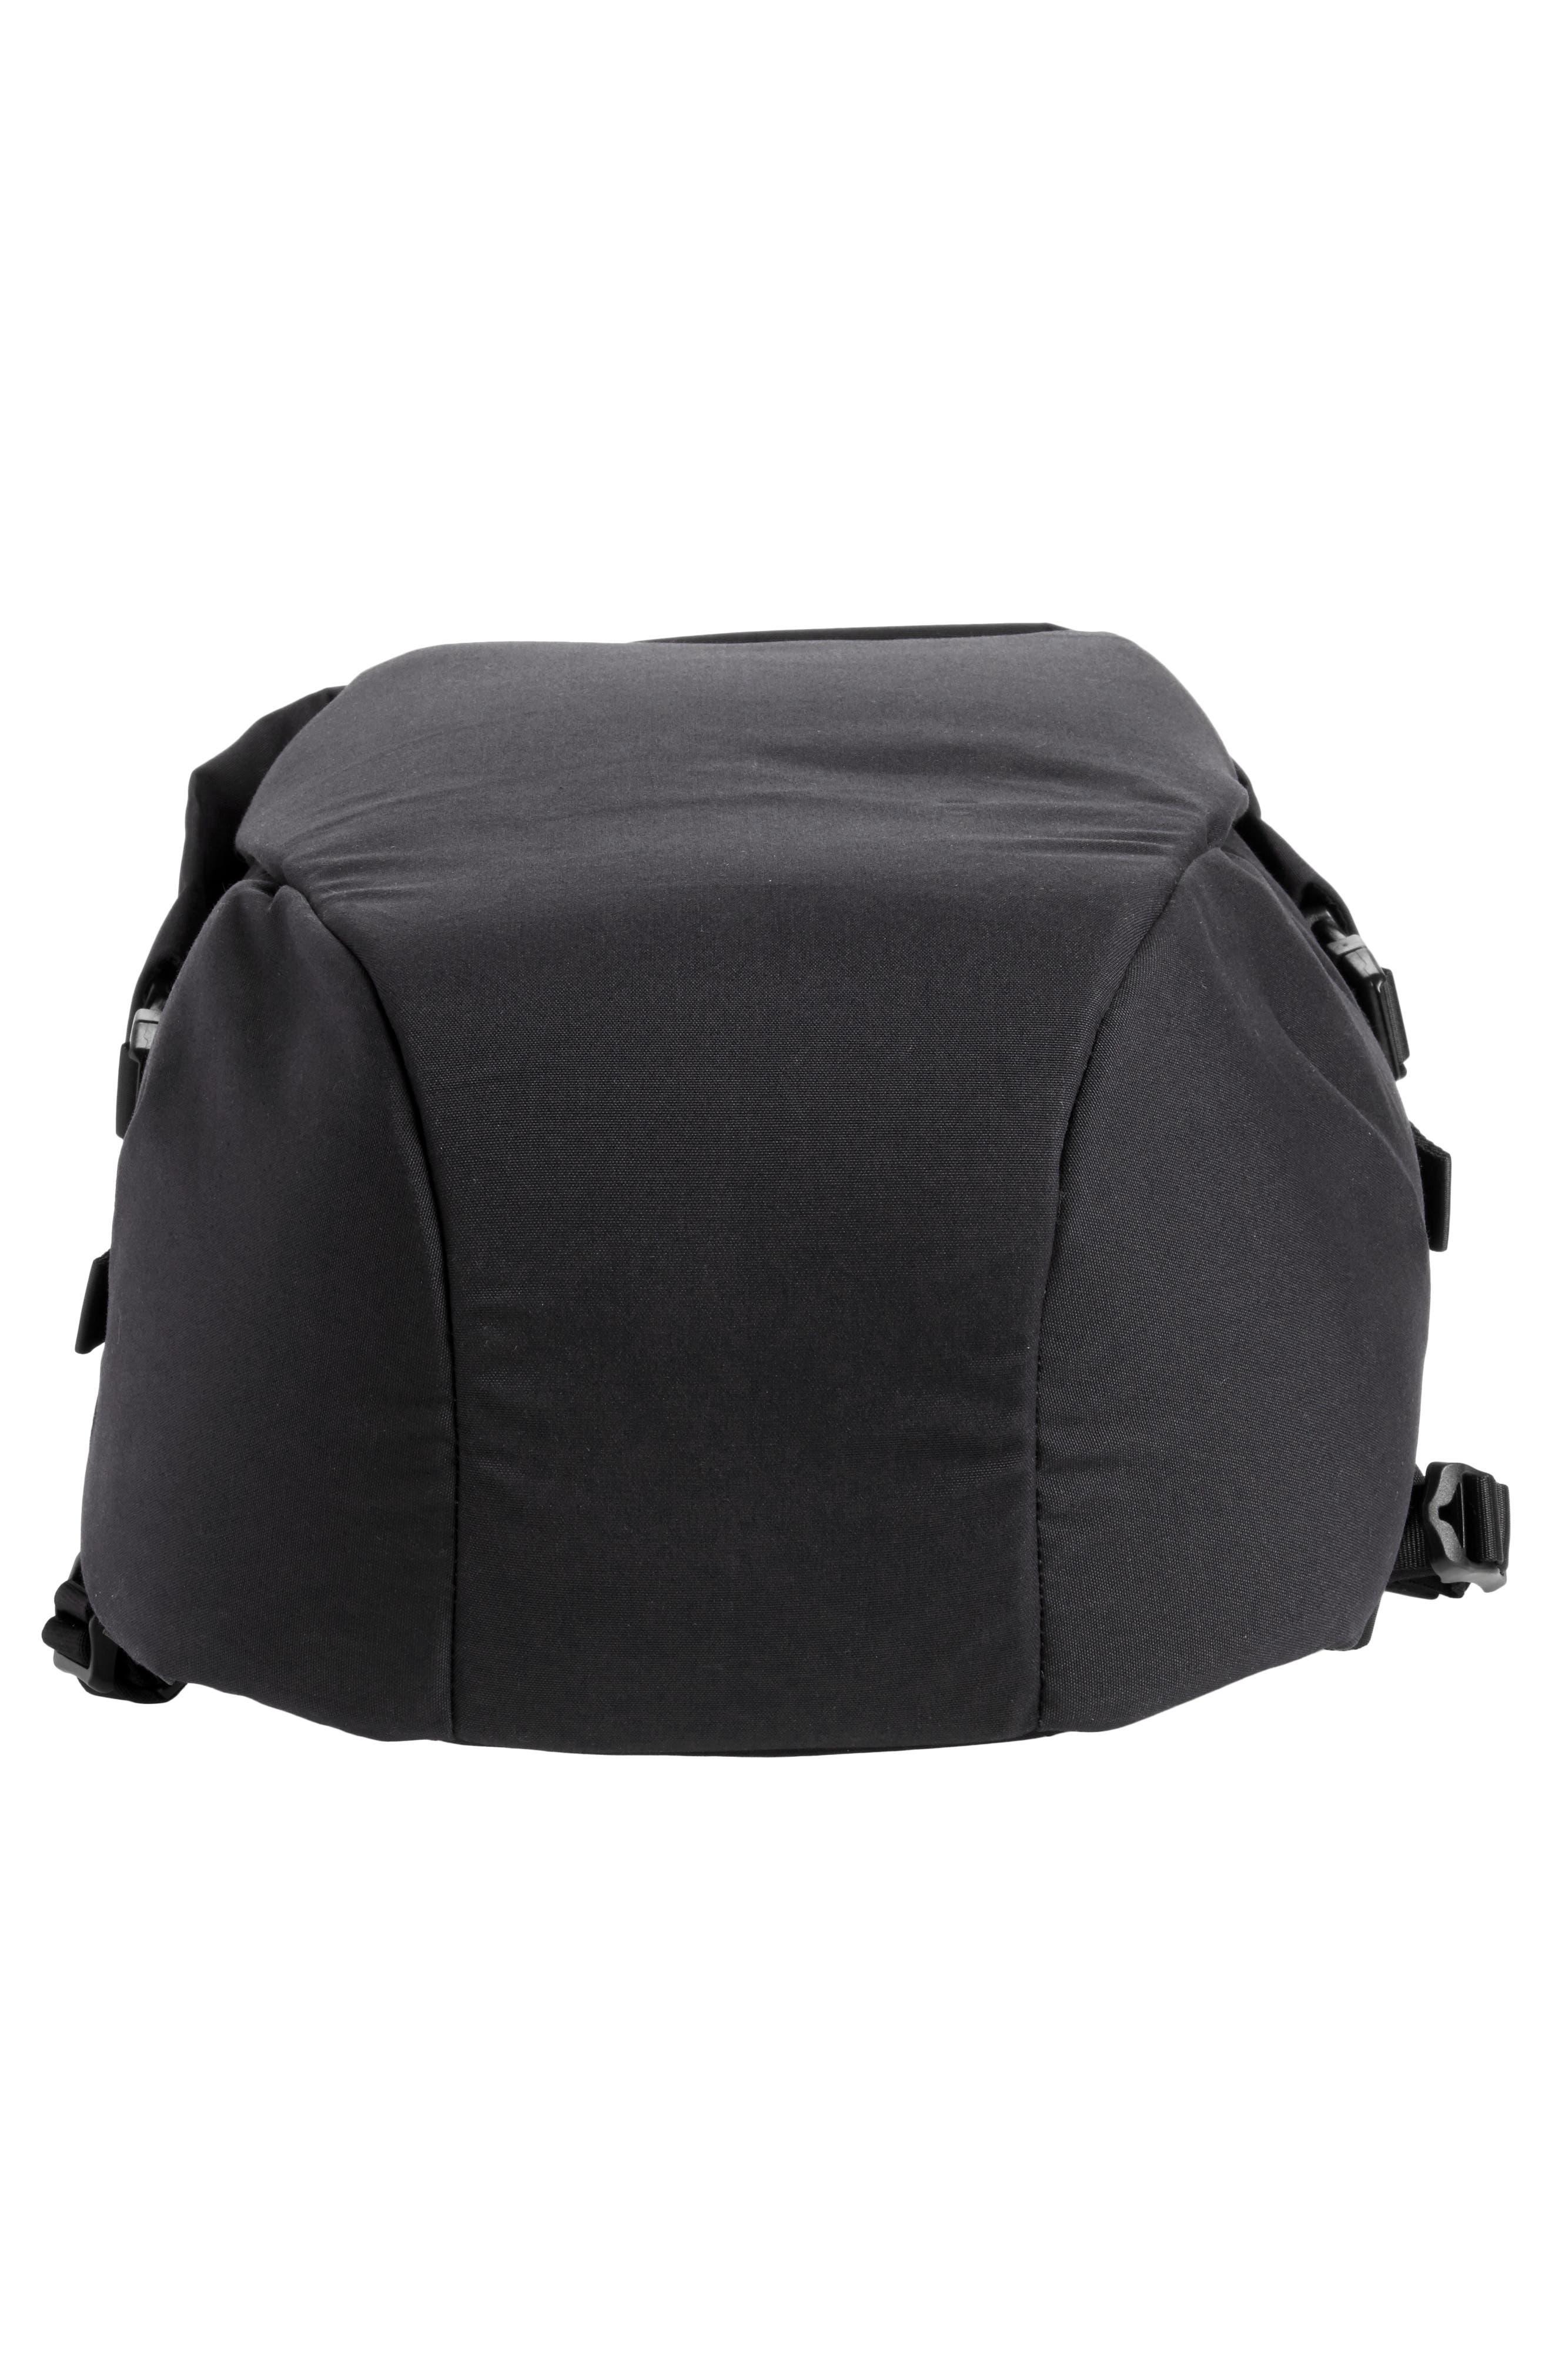 Locker Pack Lux Backpack,                             Alternate thumbnail 6, color,                             001